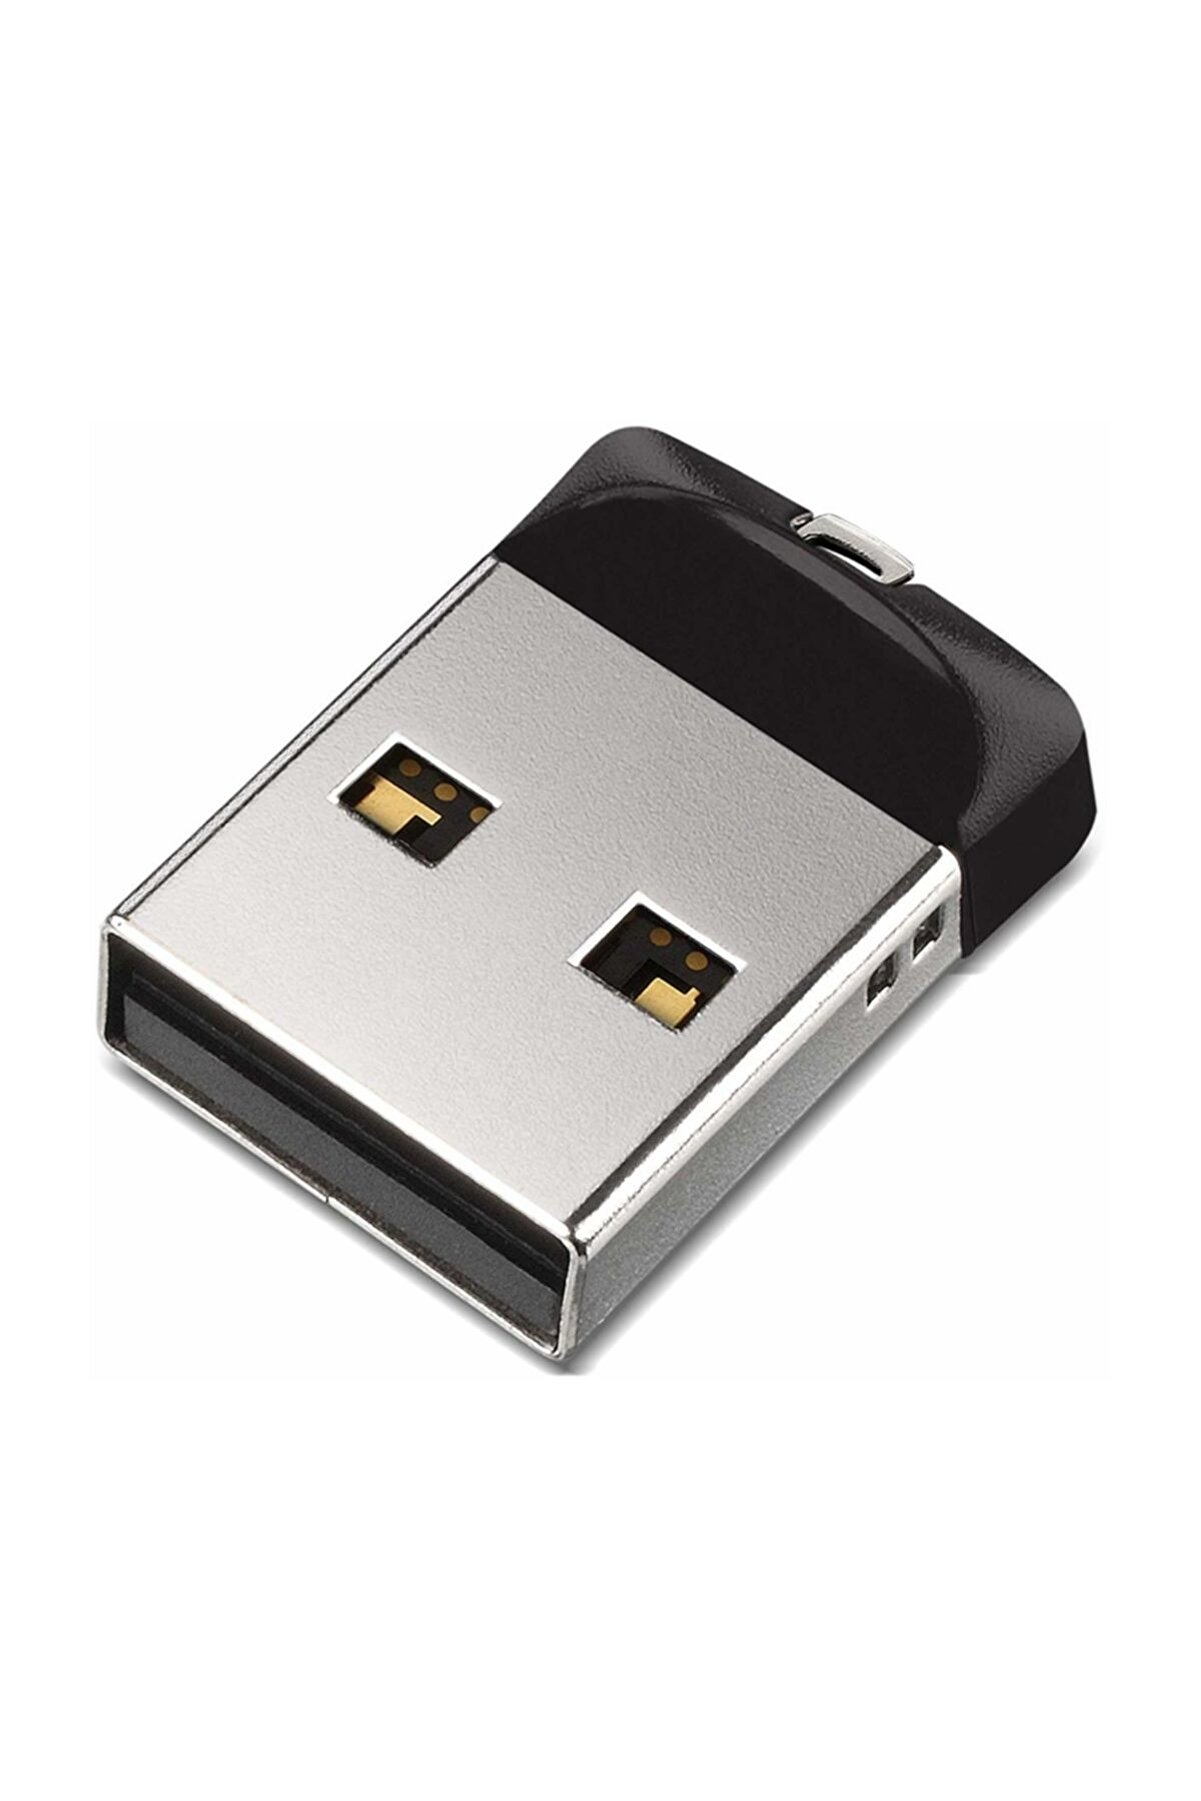 Sandisk Cruzer Fit USB 2.0 Bellek 32 GB SDCZ33-032G-G35